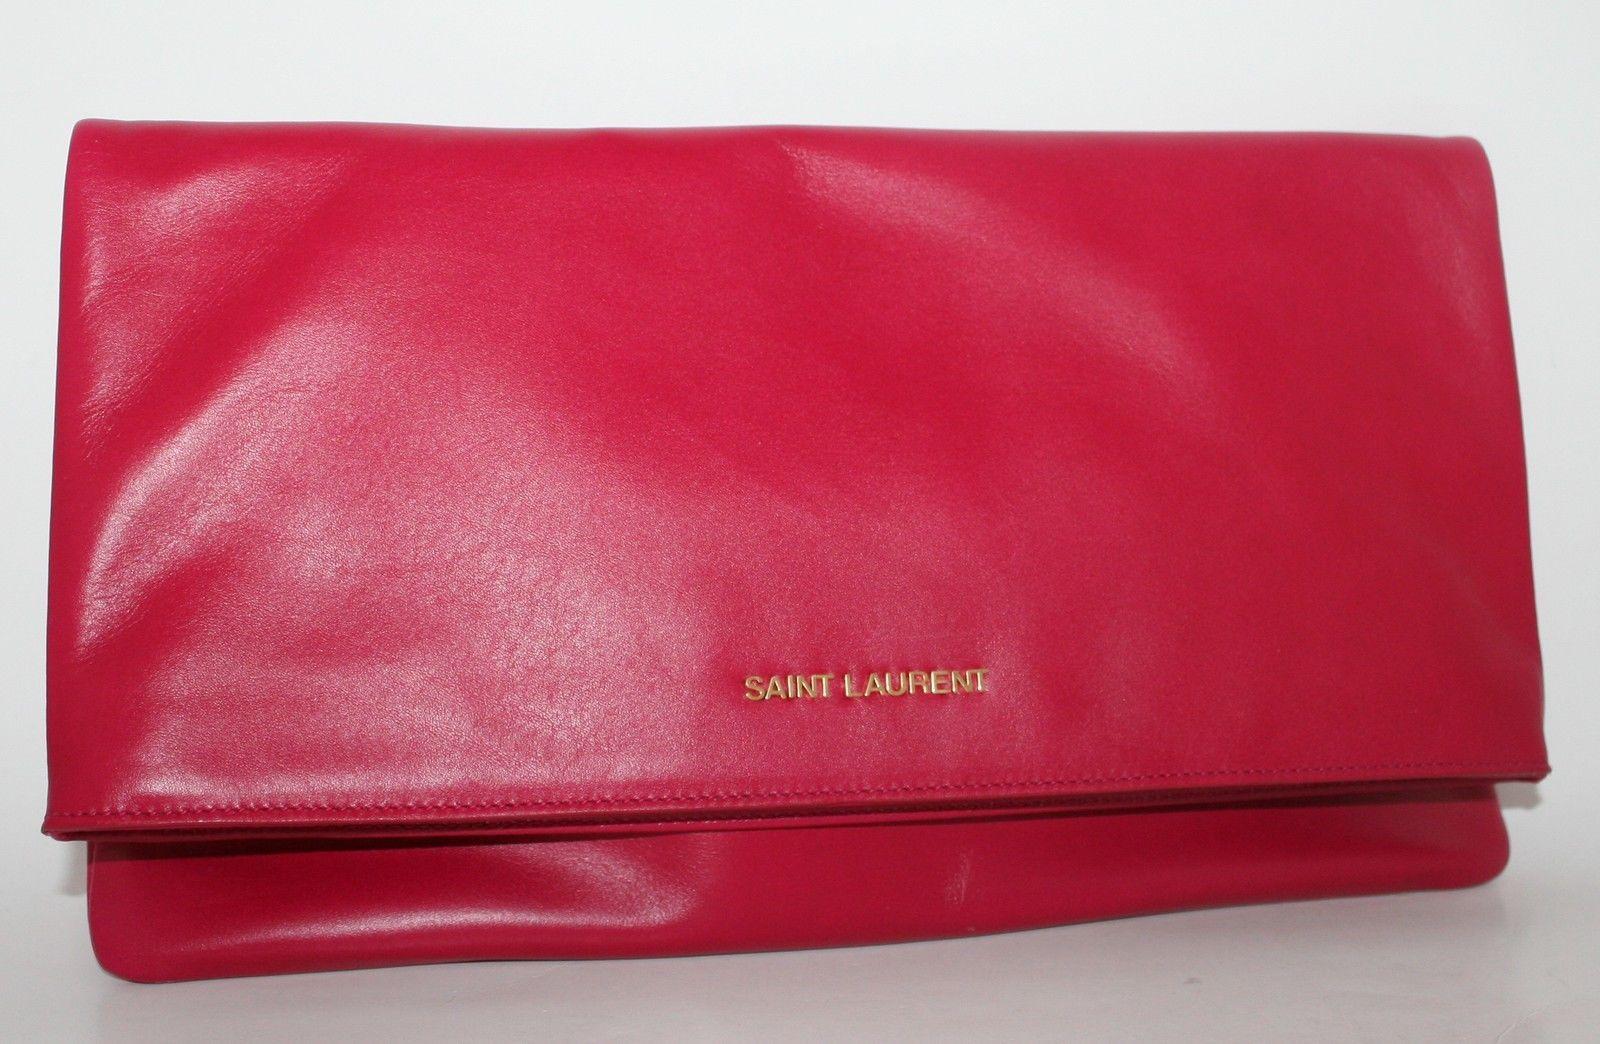 Yves Saint Laurent Handbags | Handbags Yves Saint Laurent | Ysl Clutch